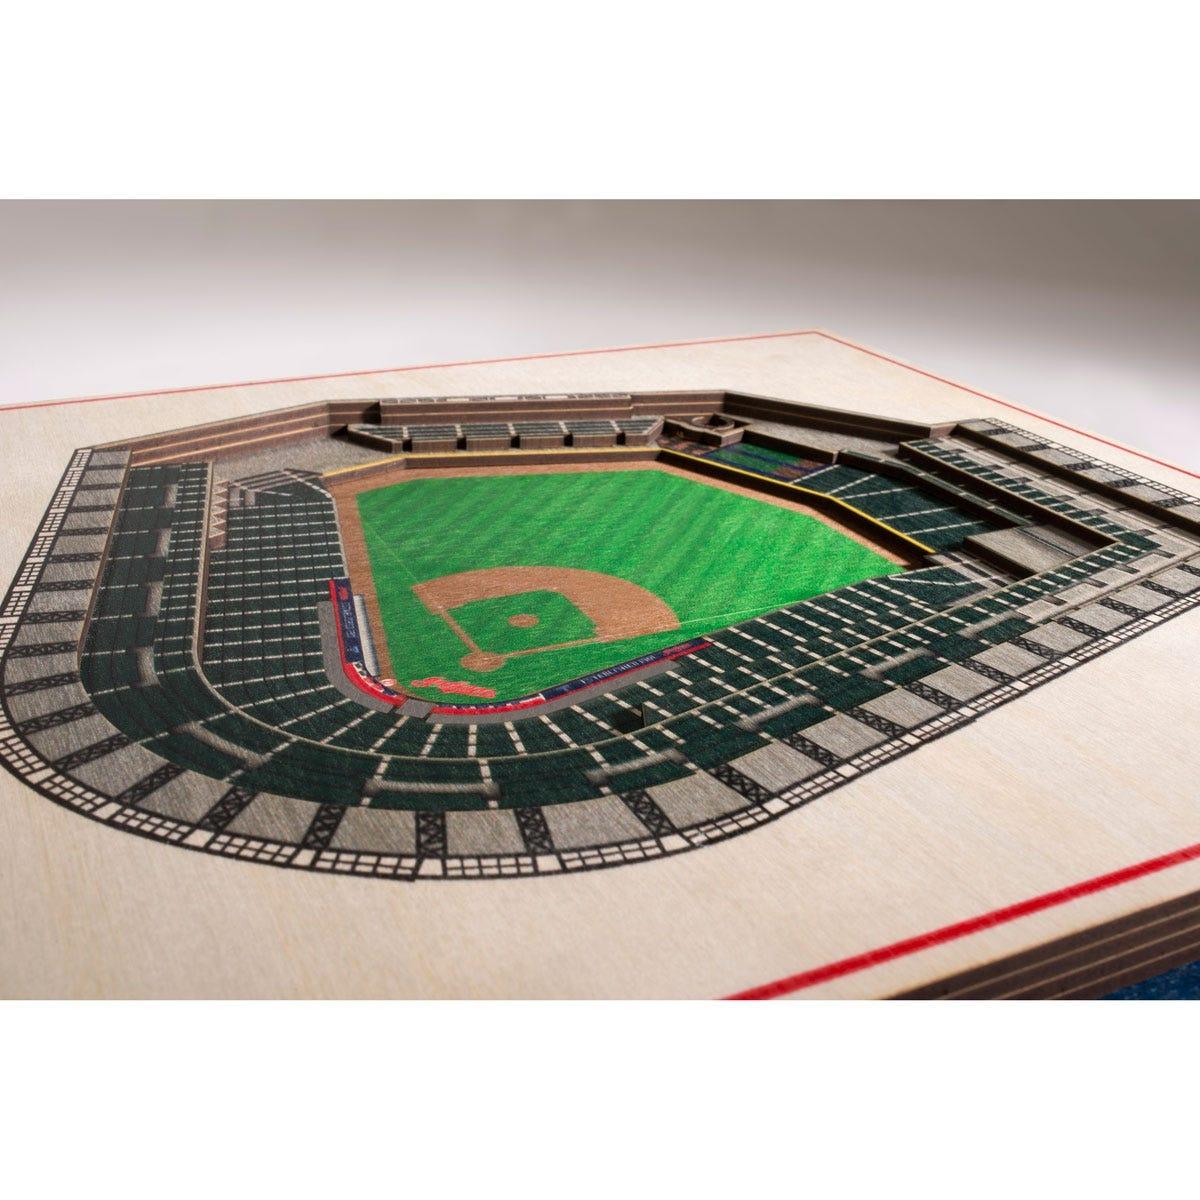 MLB 3D Stadiums